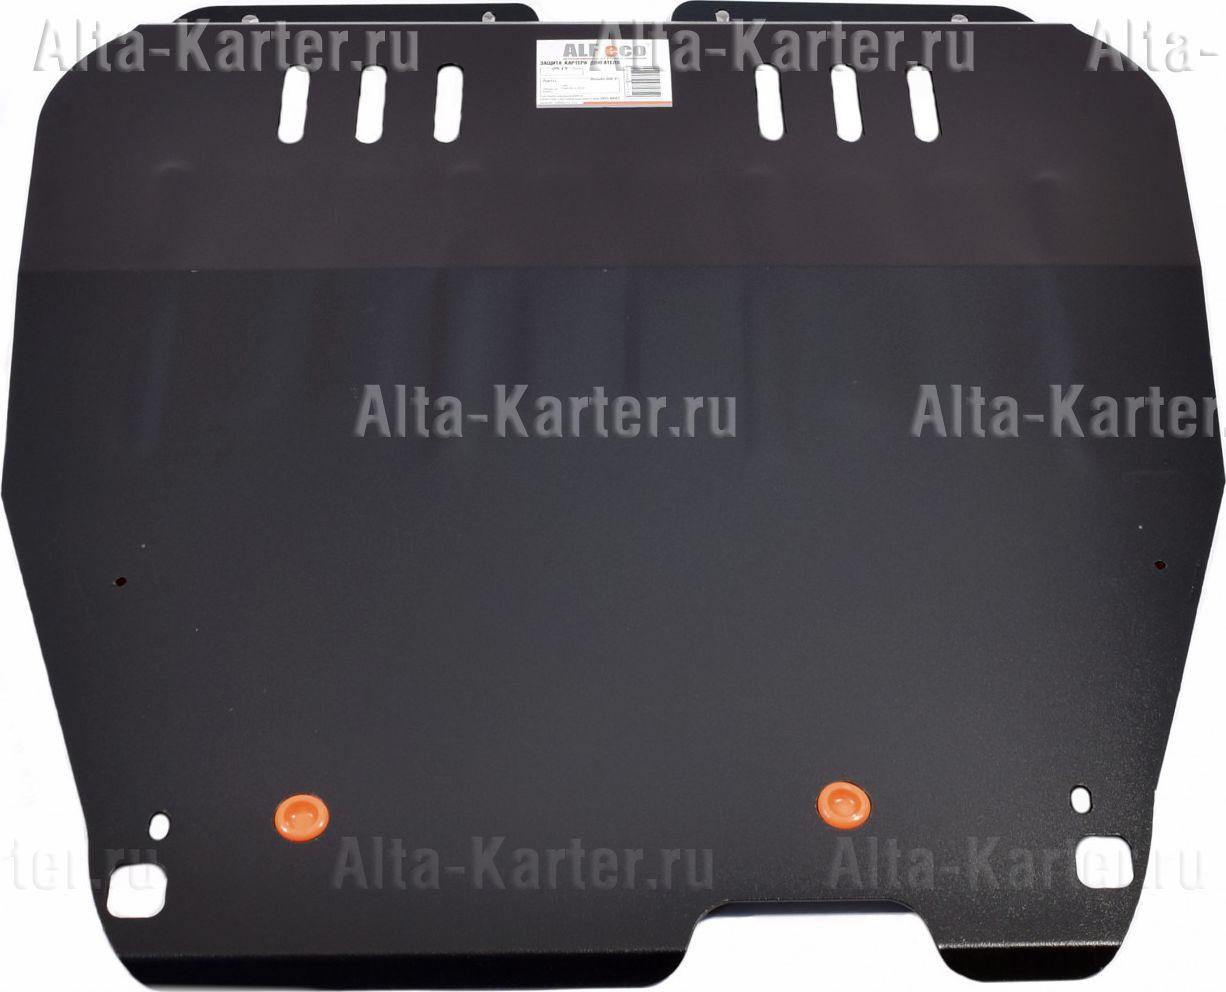 Защита Alfeco для картера и КПП Honda НR-V 1999-2006. Артикул ALF.09.15